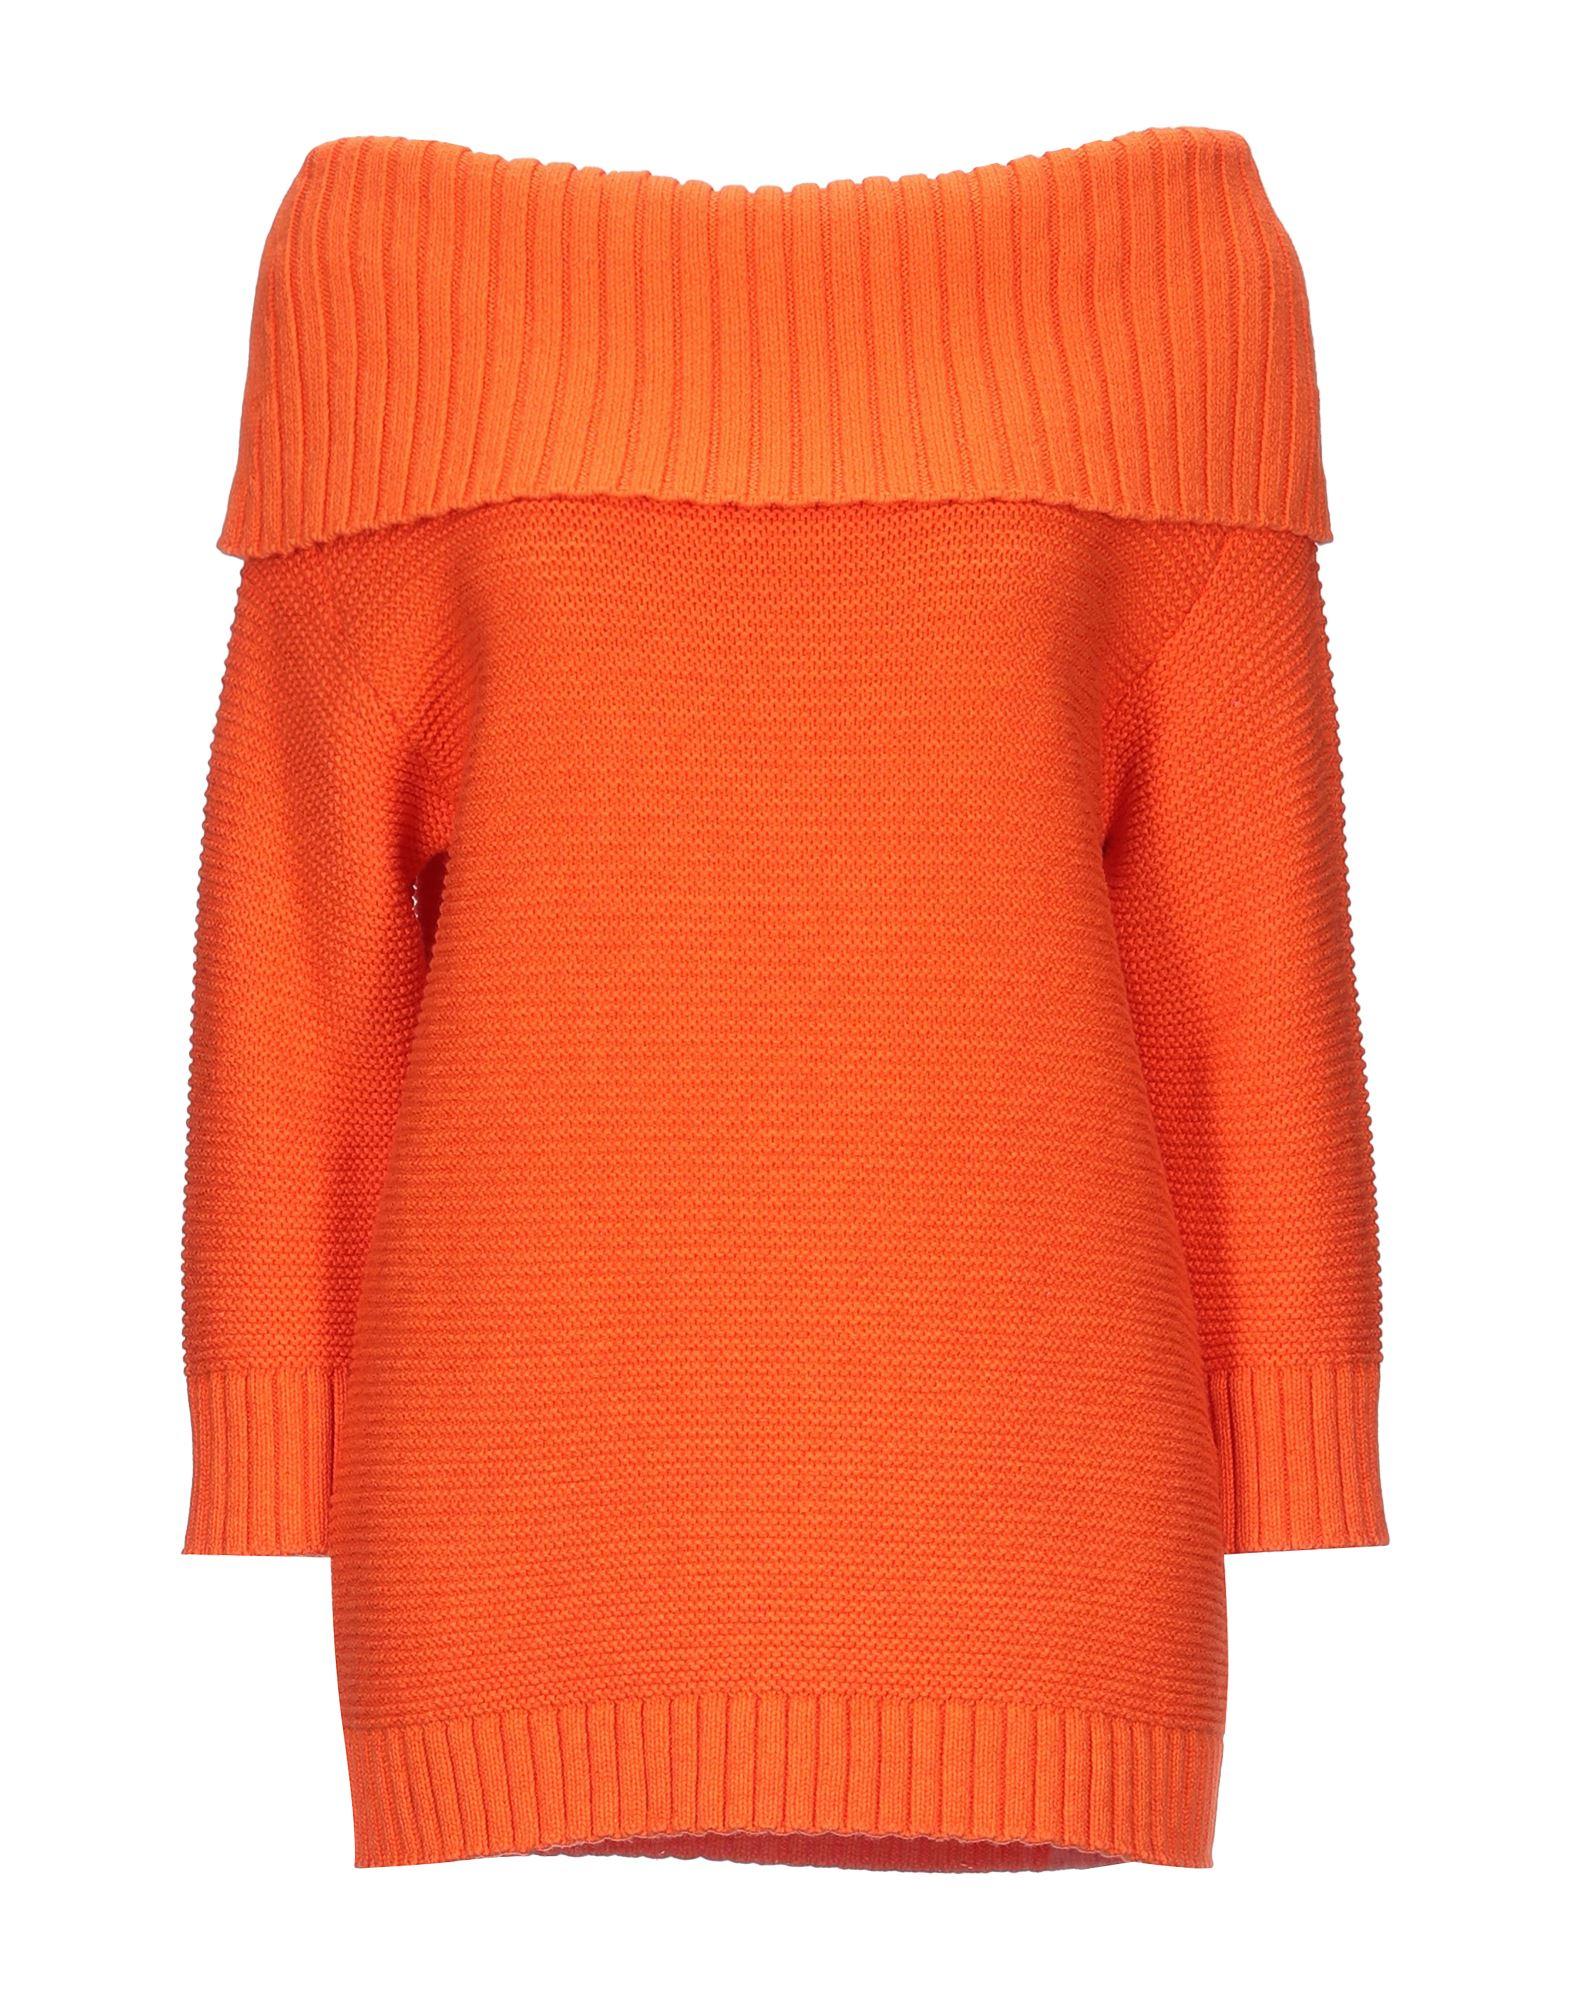 ALICE + OLIVIA Sweaters - Item 14090295